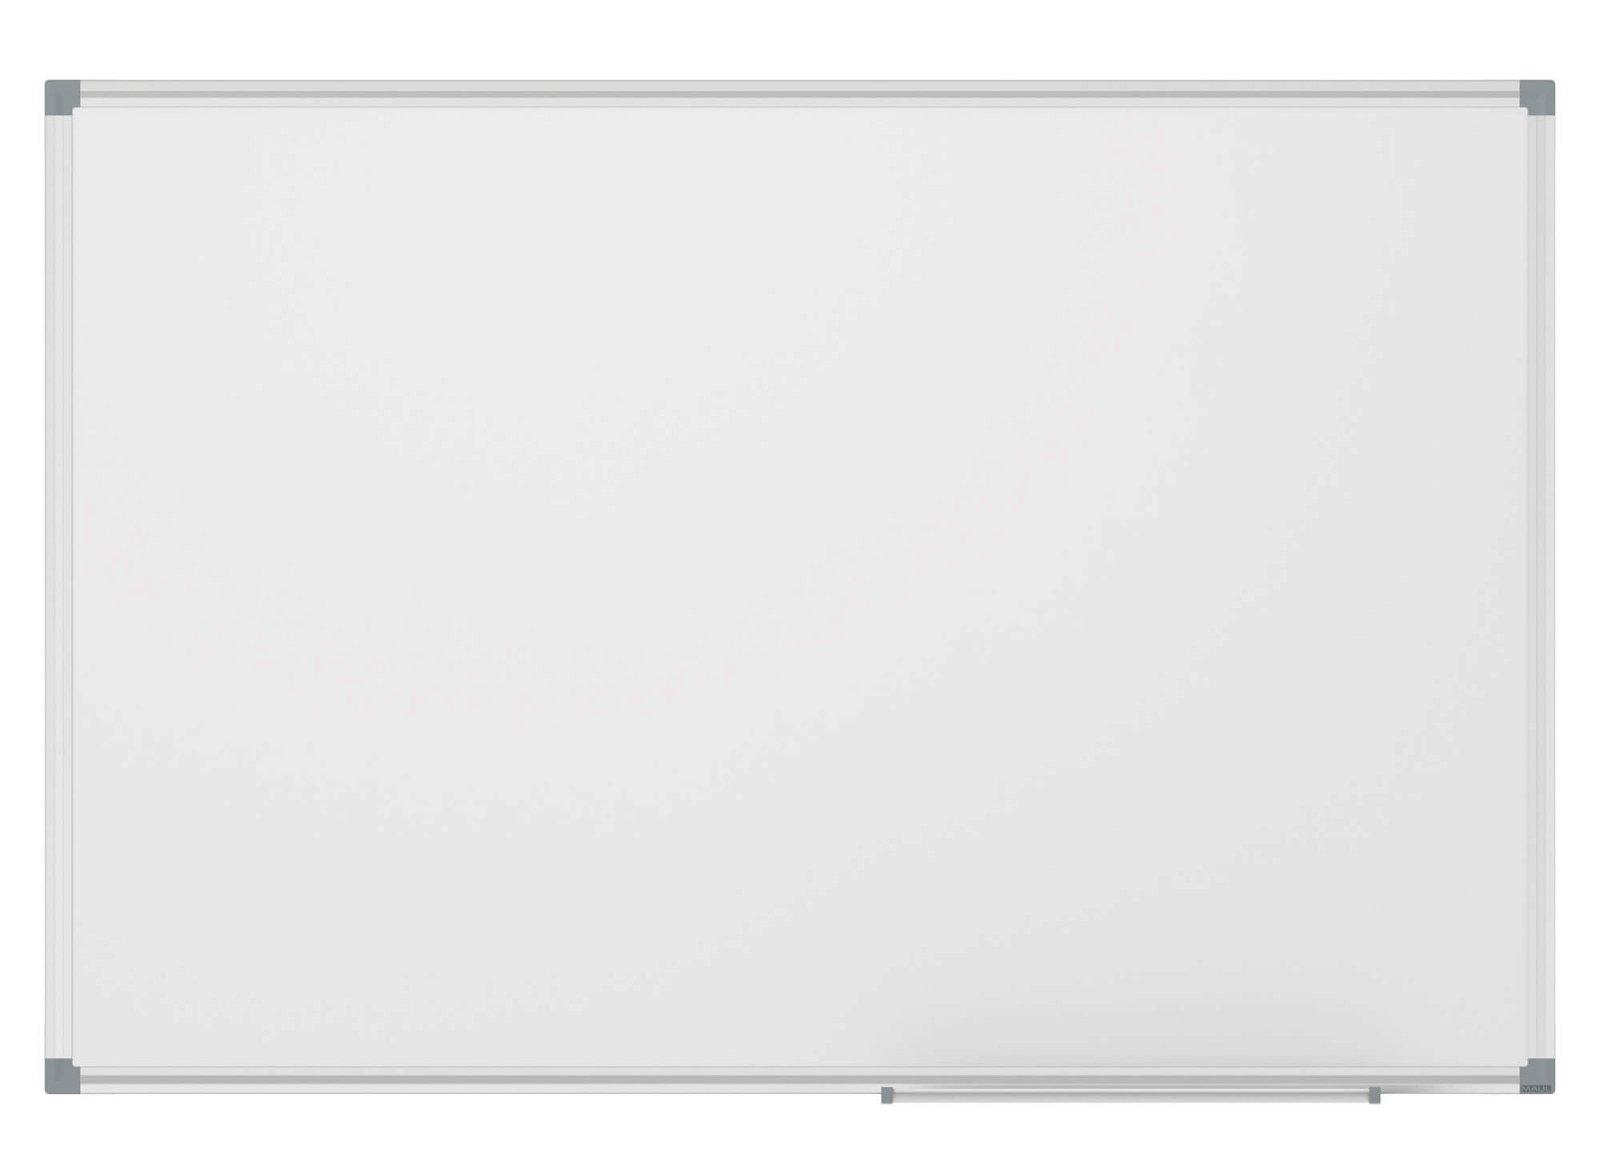 Whiteboard MAULstandard, Emaille